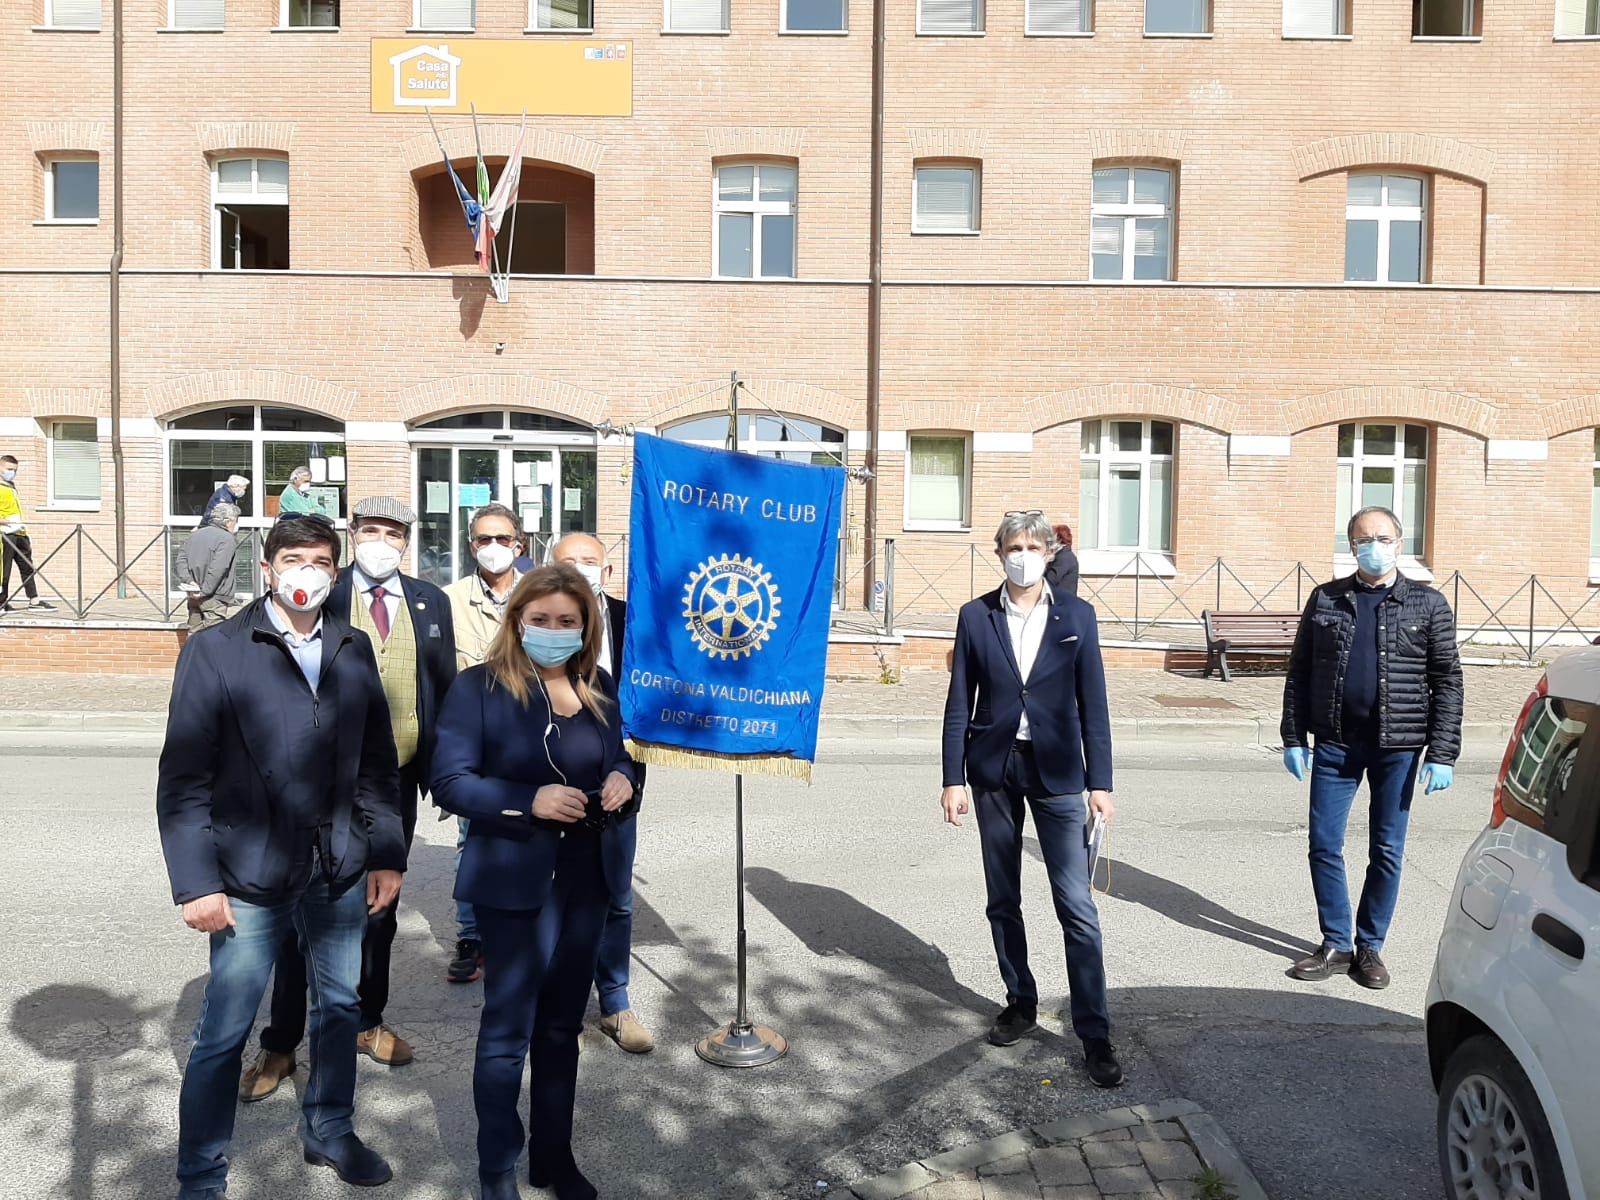 Rotary Club Cortona Valdichiana dona mascherine al Distretto Sanitario